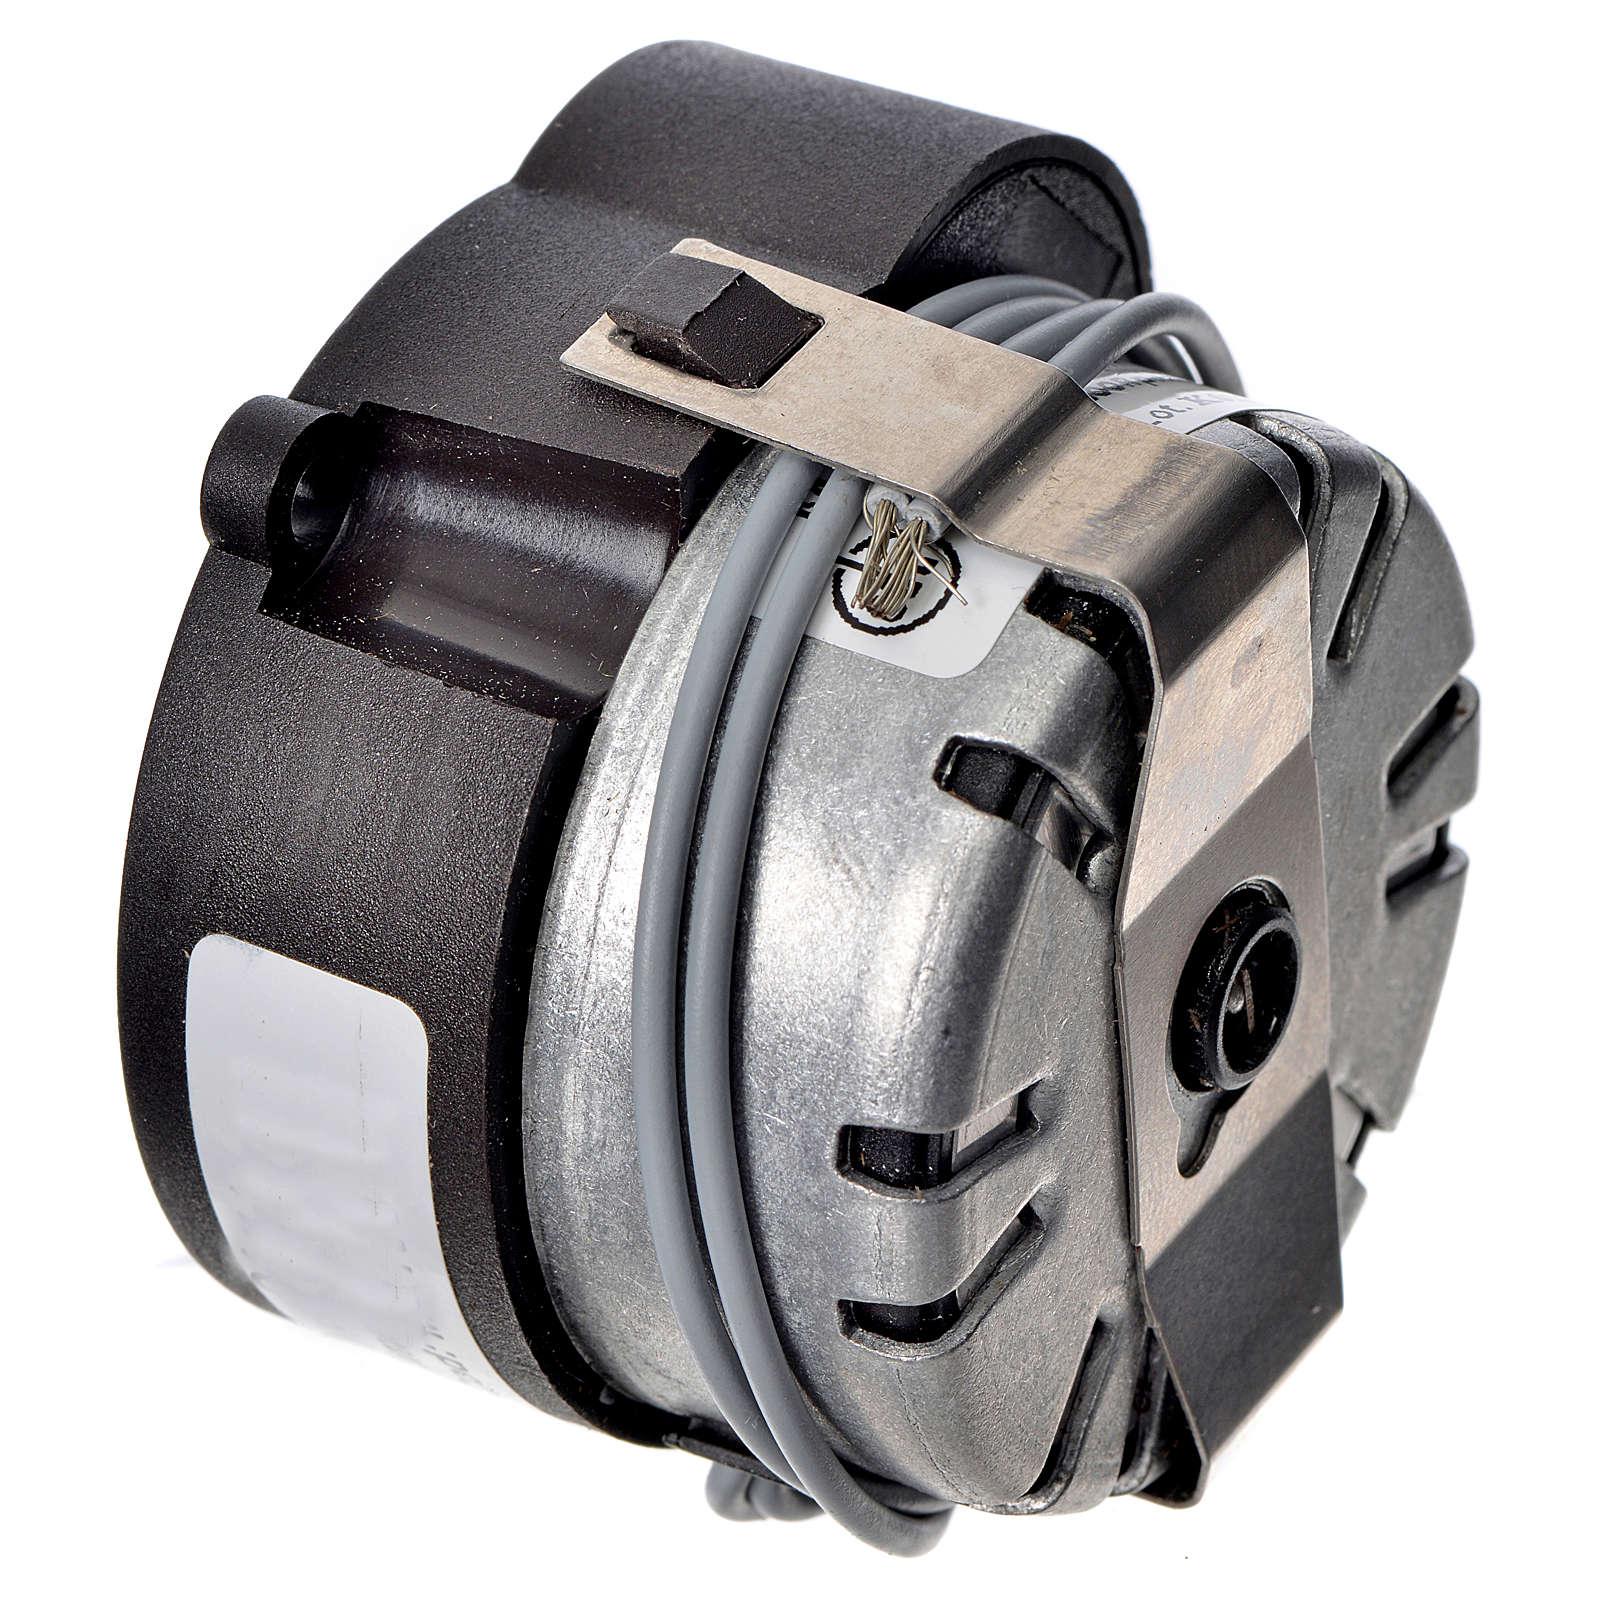 Motoriduttore presepe  MR giri/minuto  1/3 4